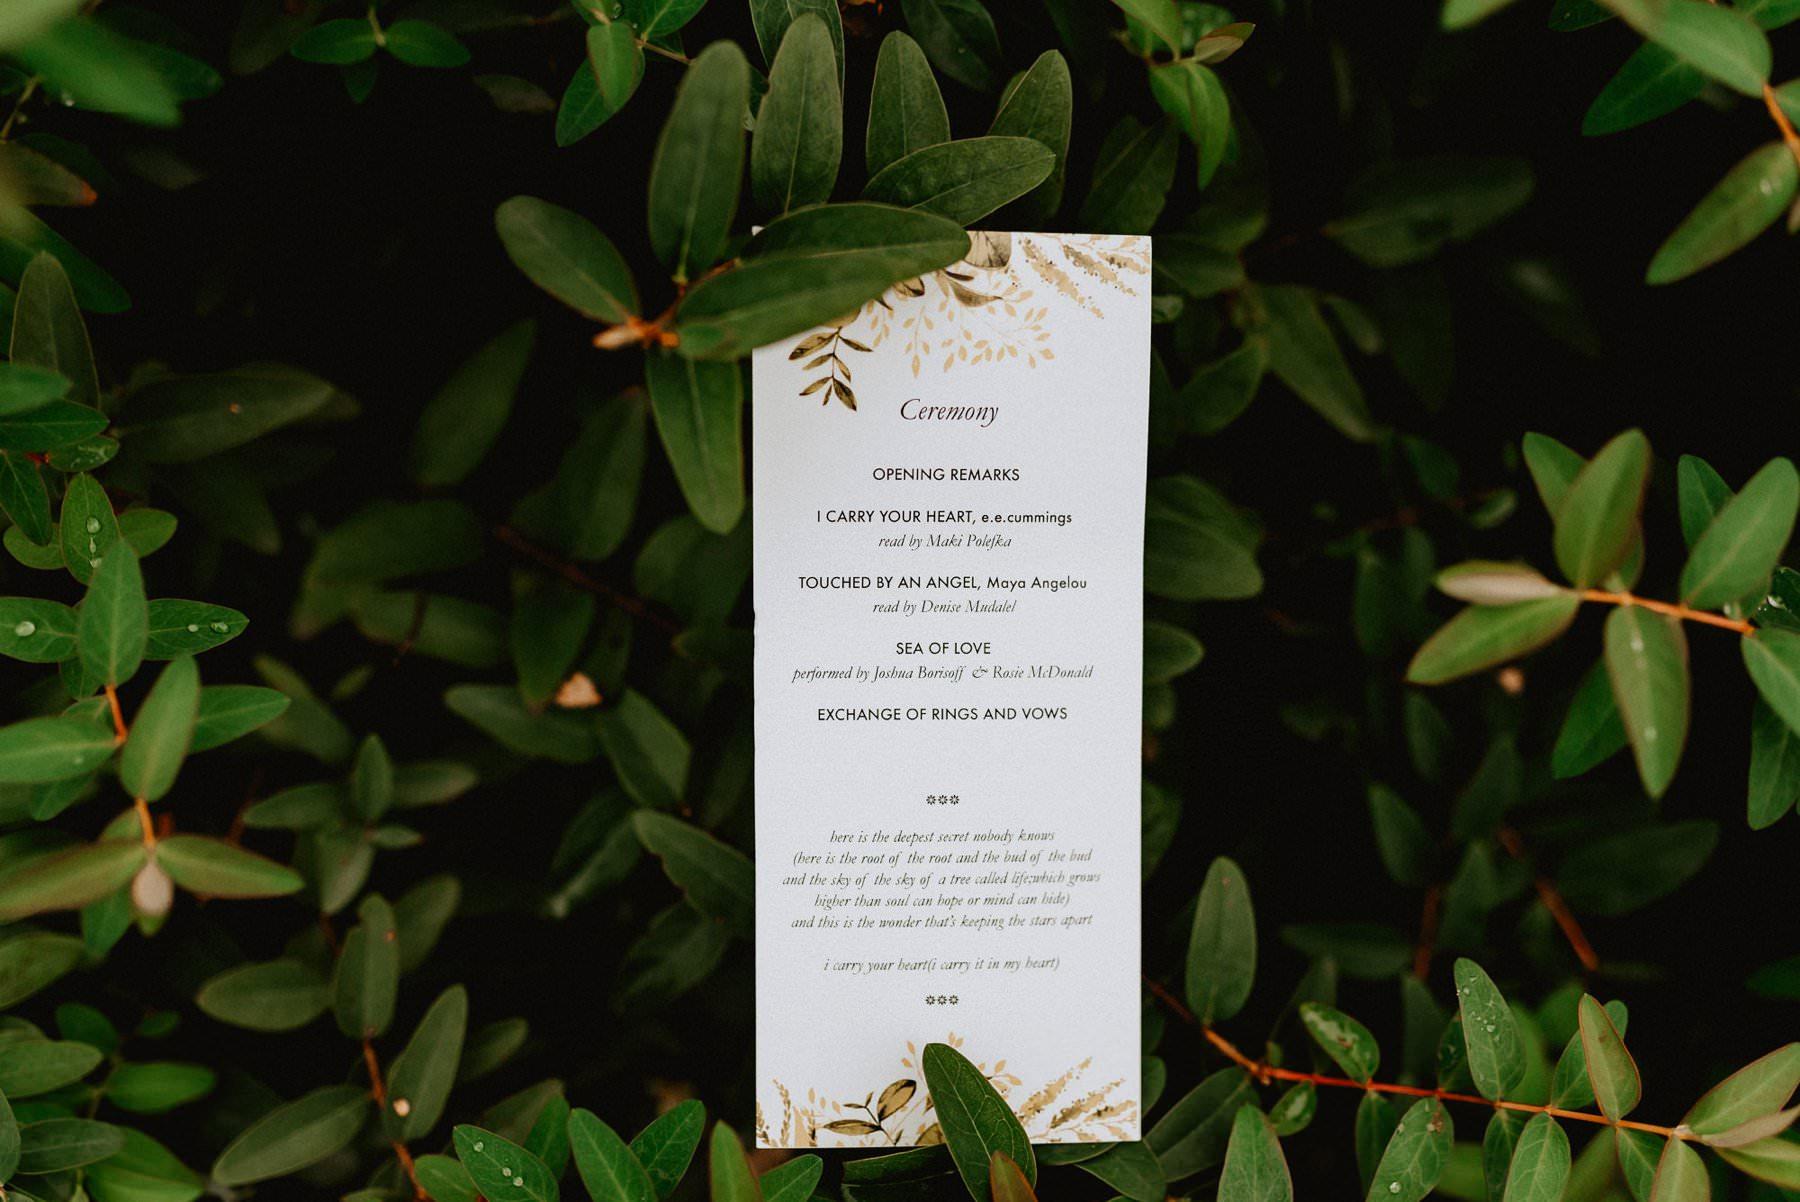 John_James_Audubon_Center_wedding-3.jpg